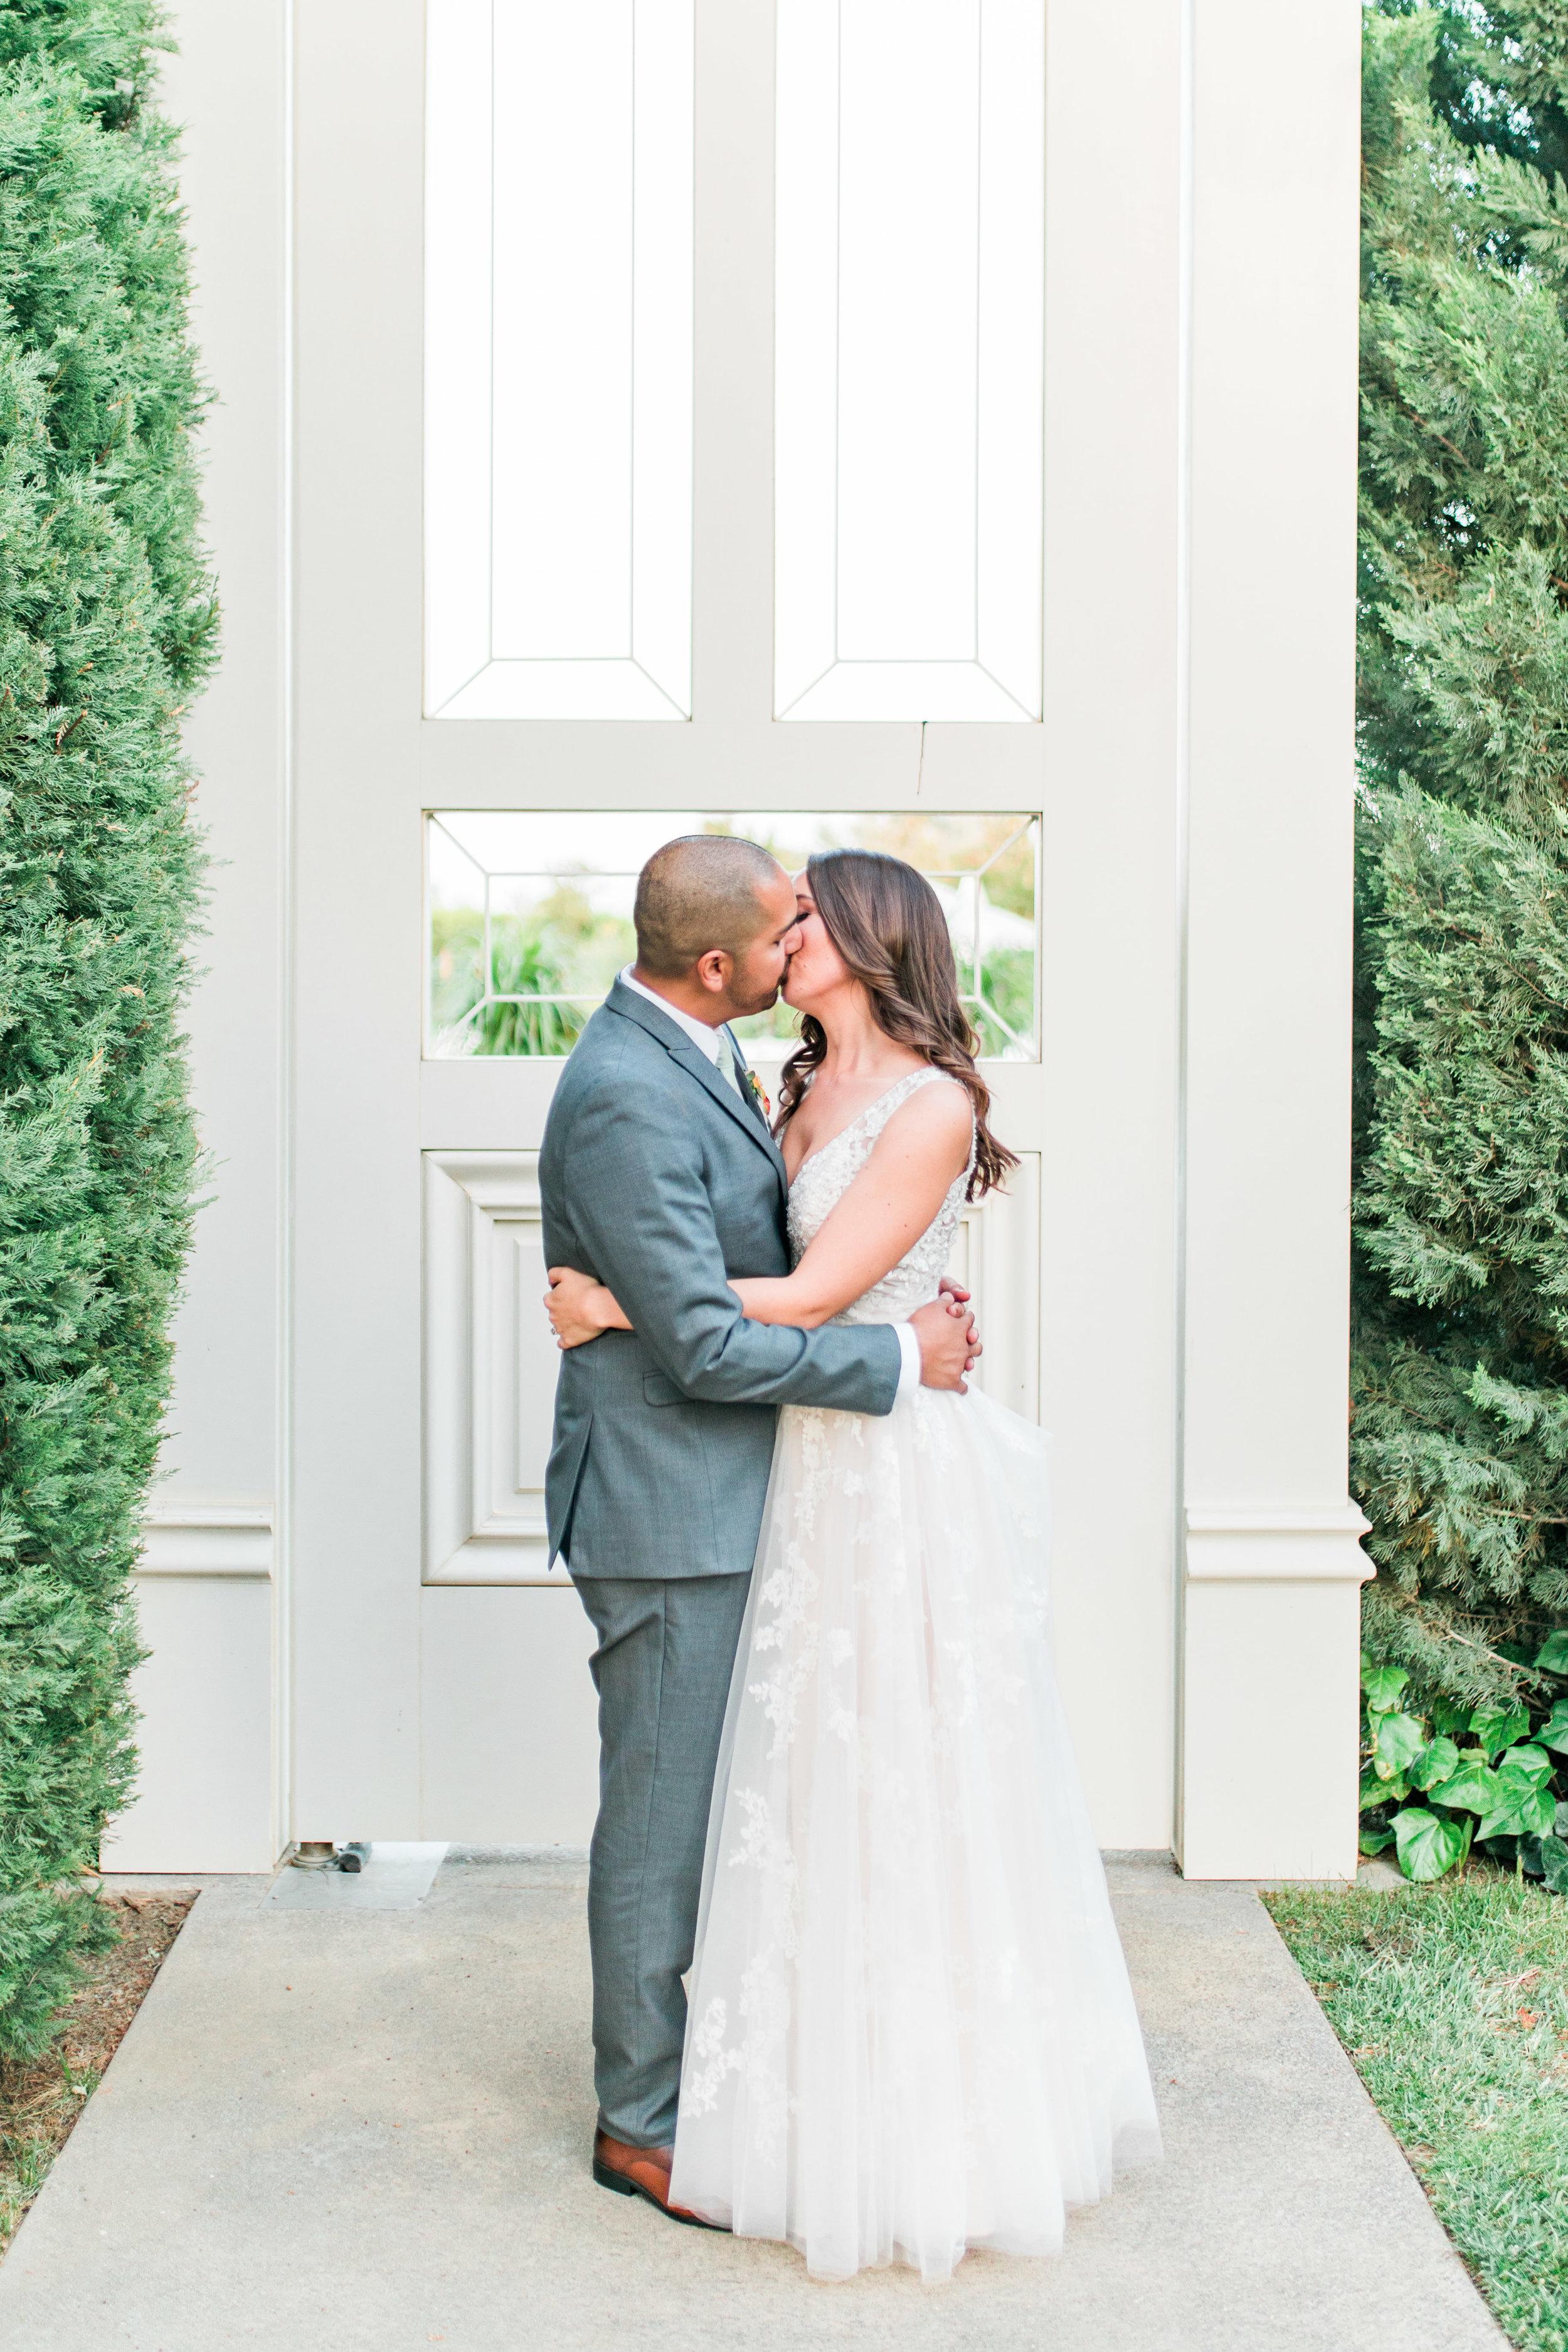 Tess-Jesse-Wedding-SP-by-JBJ-Pictures-21.jpg